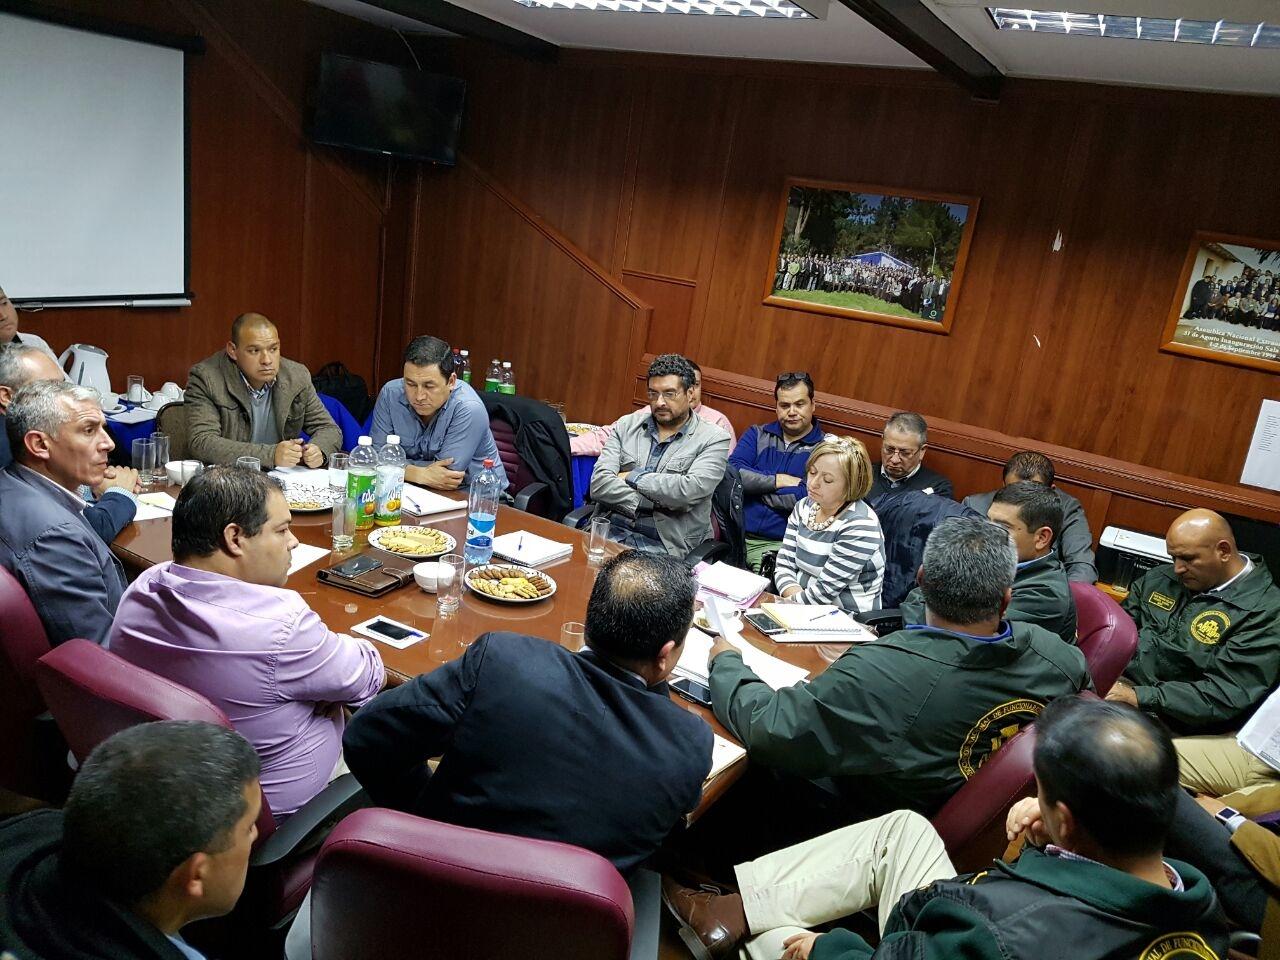 reunion-de-gremios-gendarmeria-de-chile-5